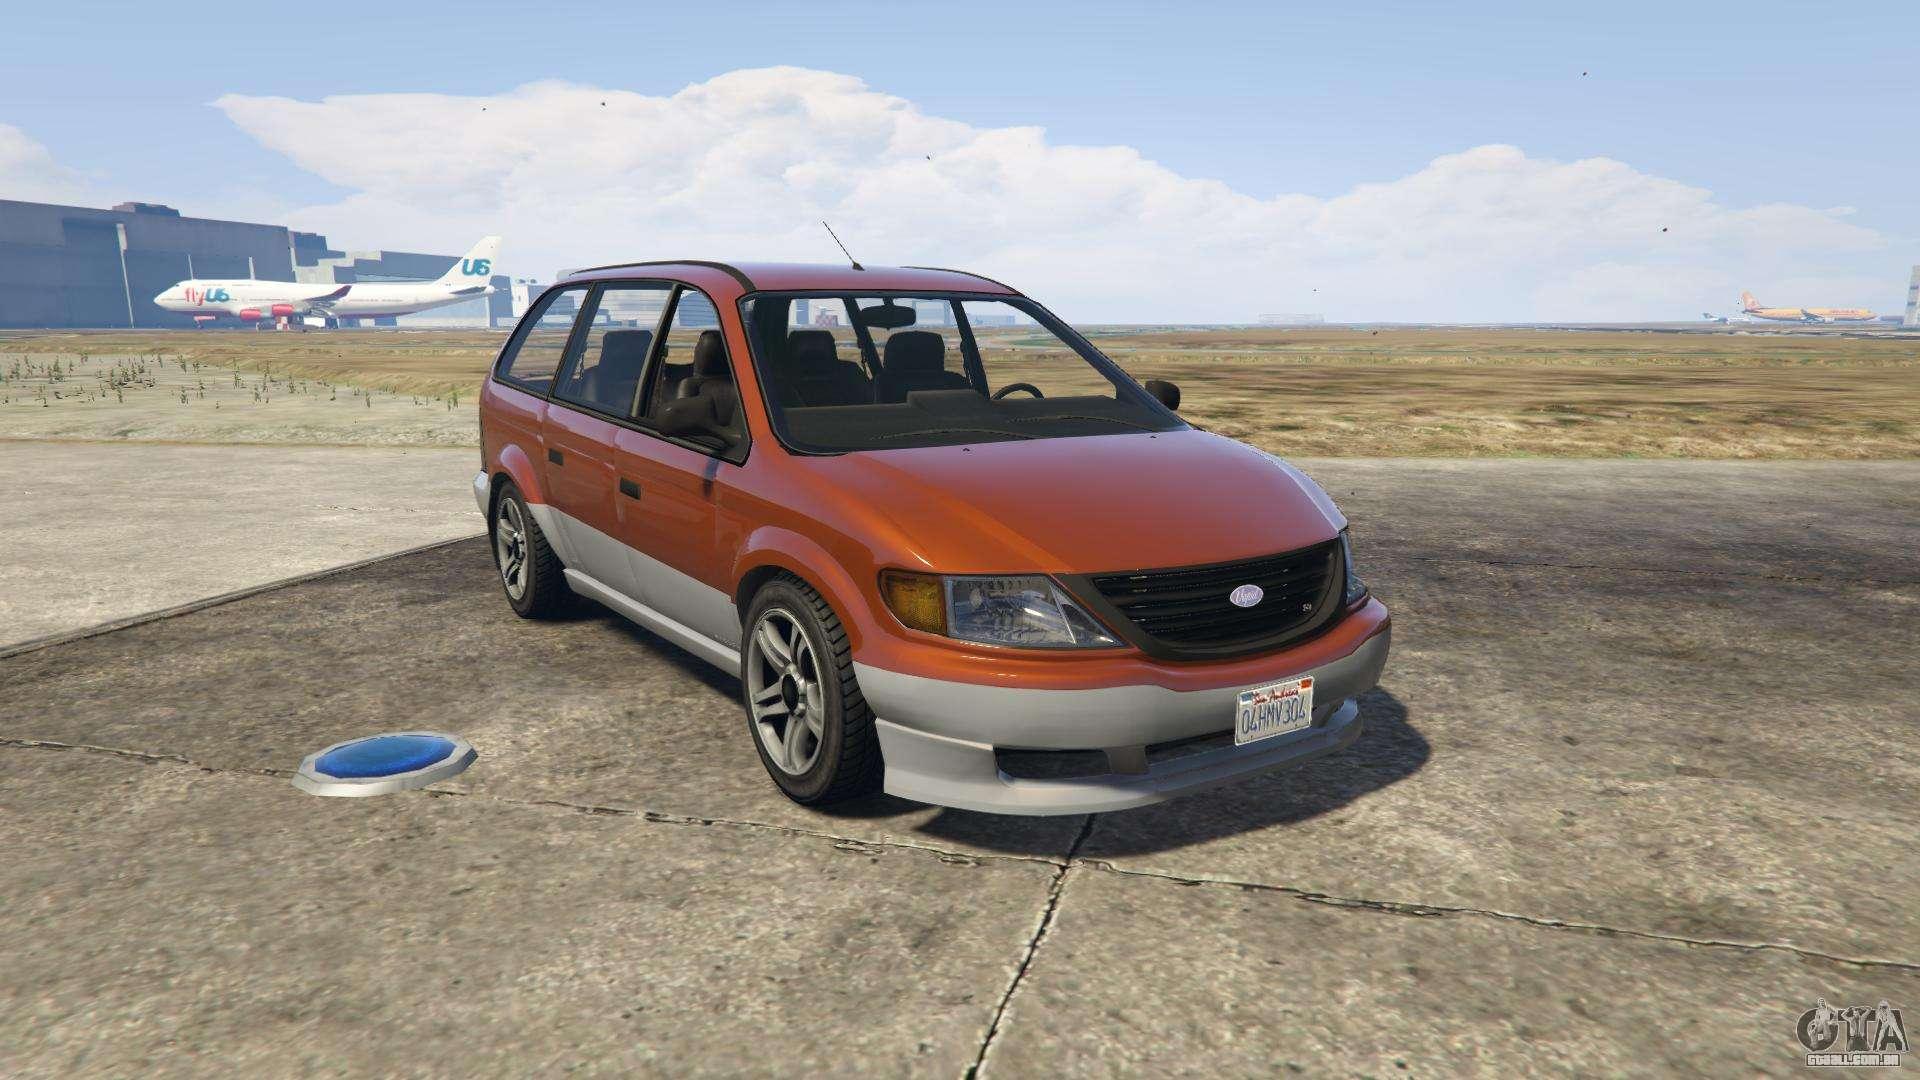 GTA 5 Vapid Minivan - vista frontal